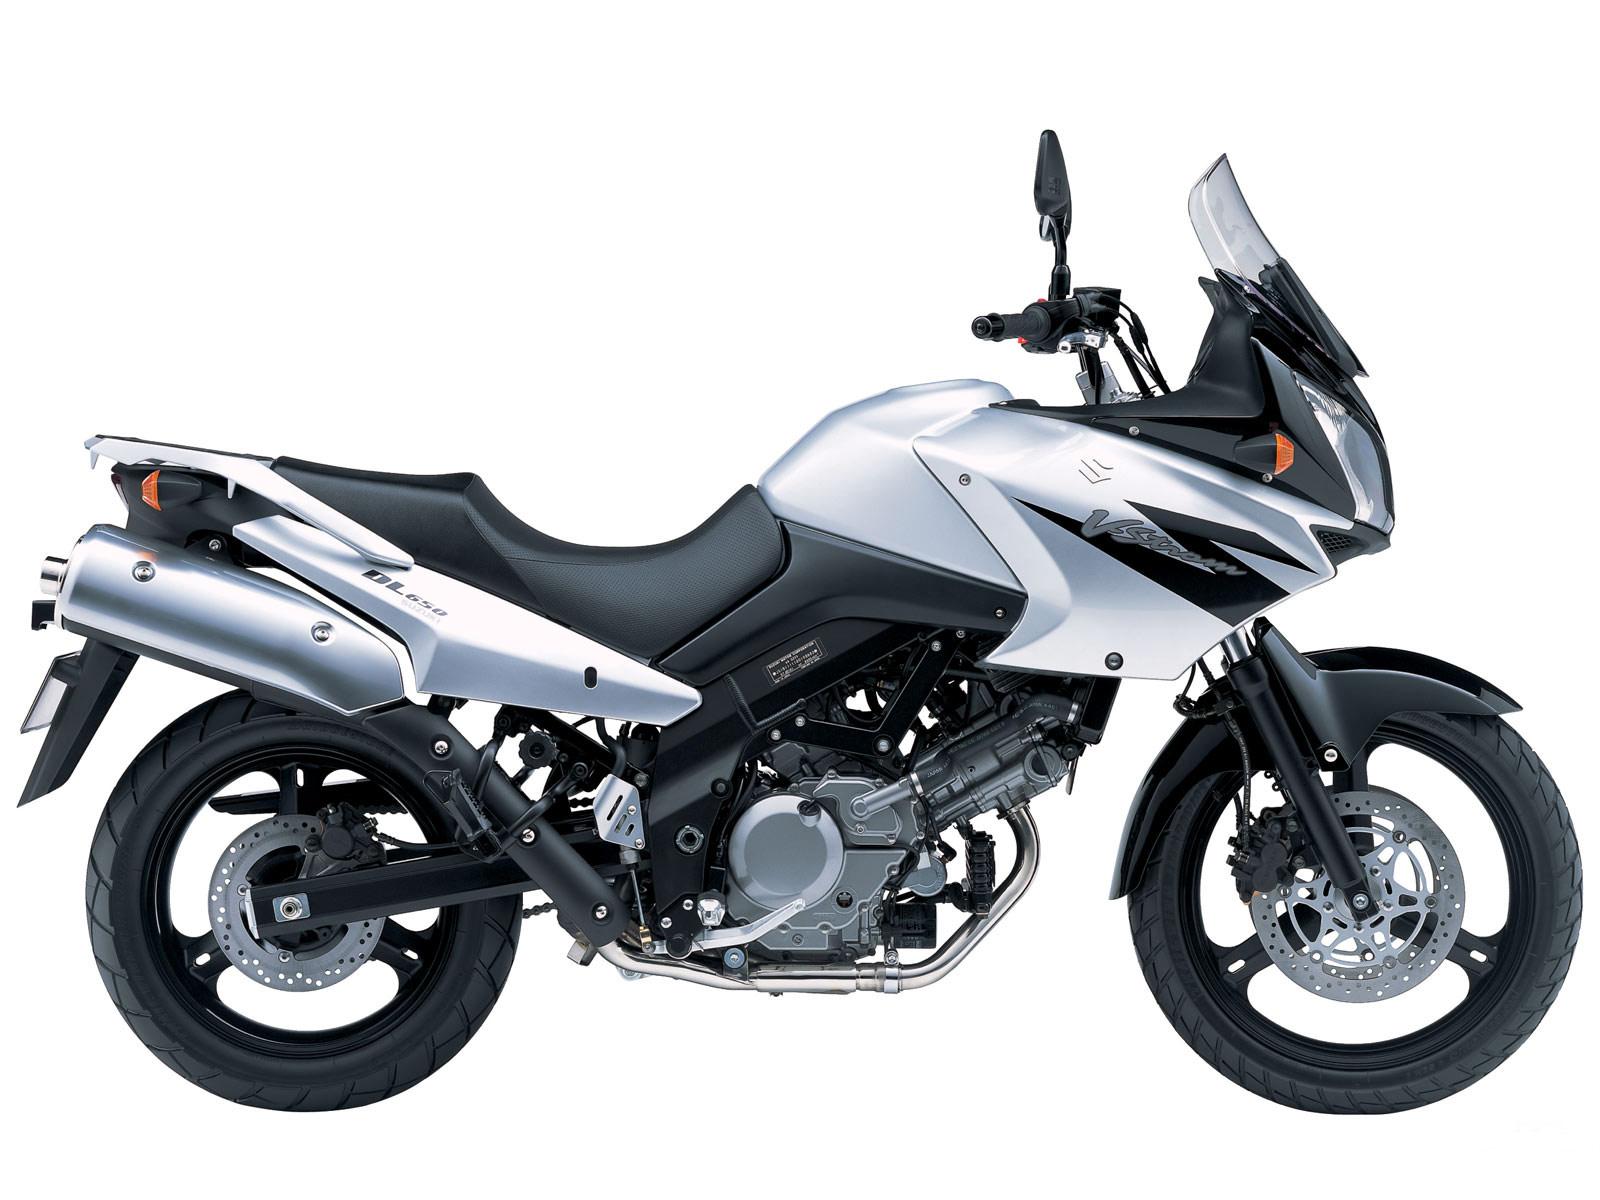 2005 Suzuki V Strom 650 Motorcycle Desktop Wallpaper